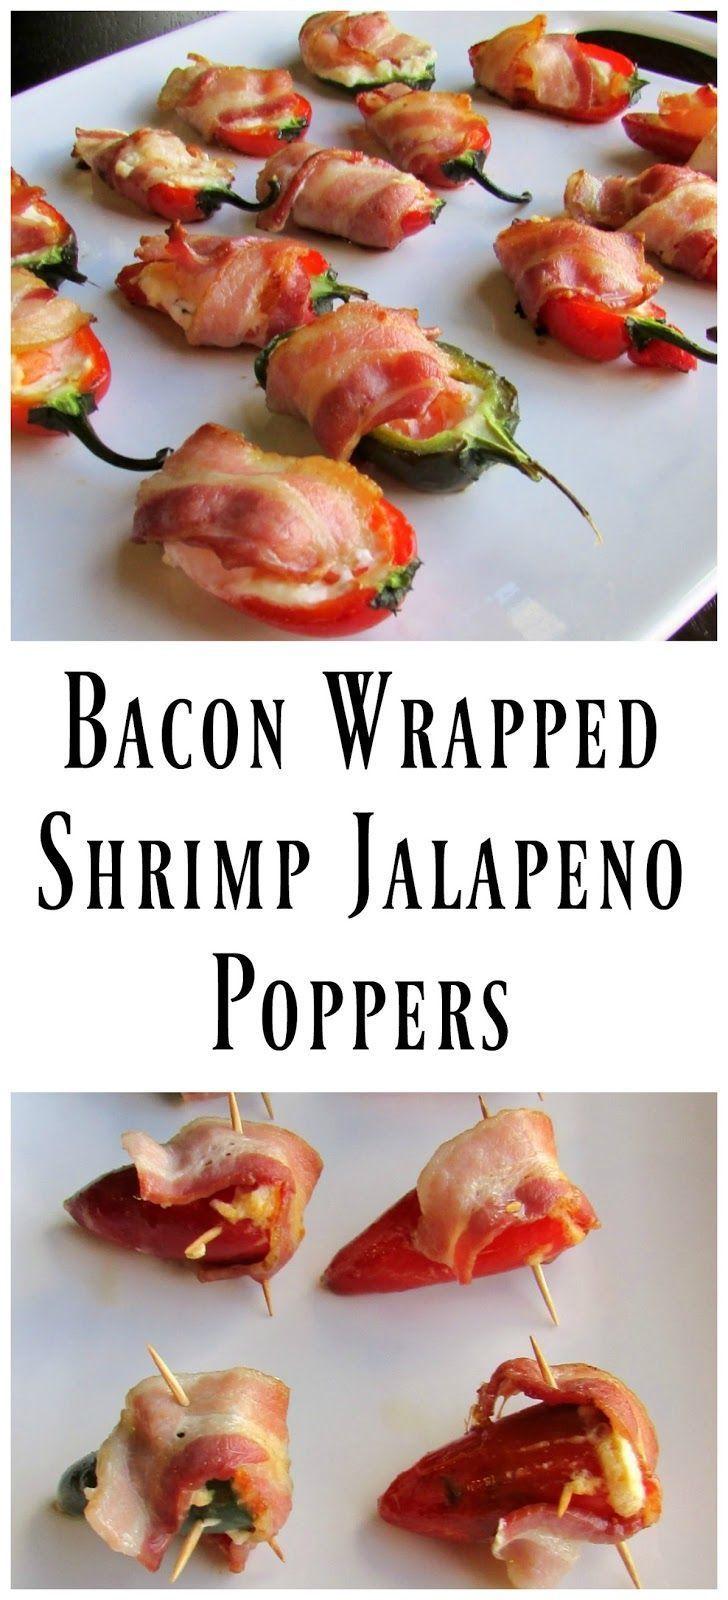 Blue apron bayonne - Bacon Wrapped Shrimp Jalapeno Poppers